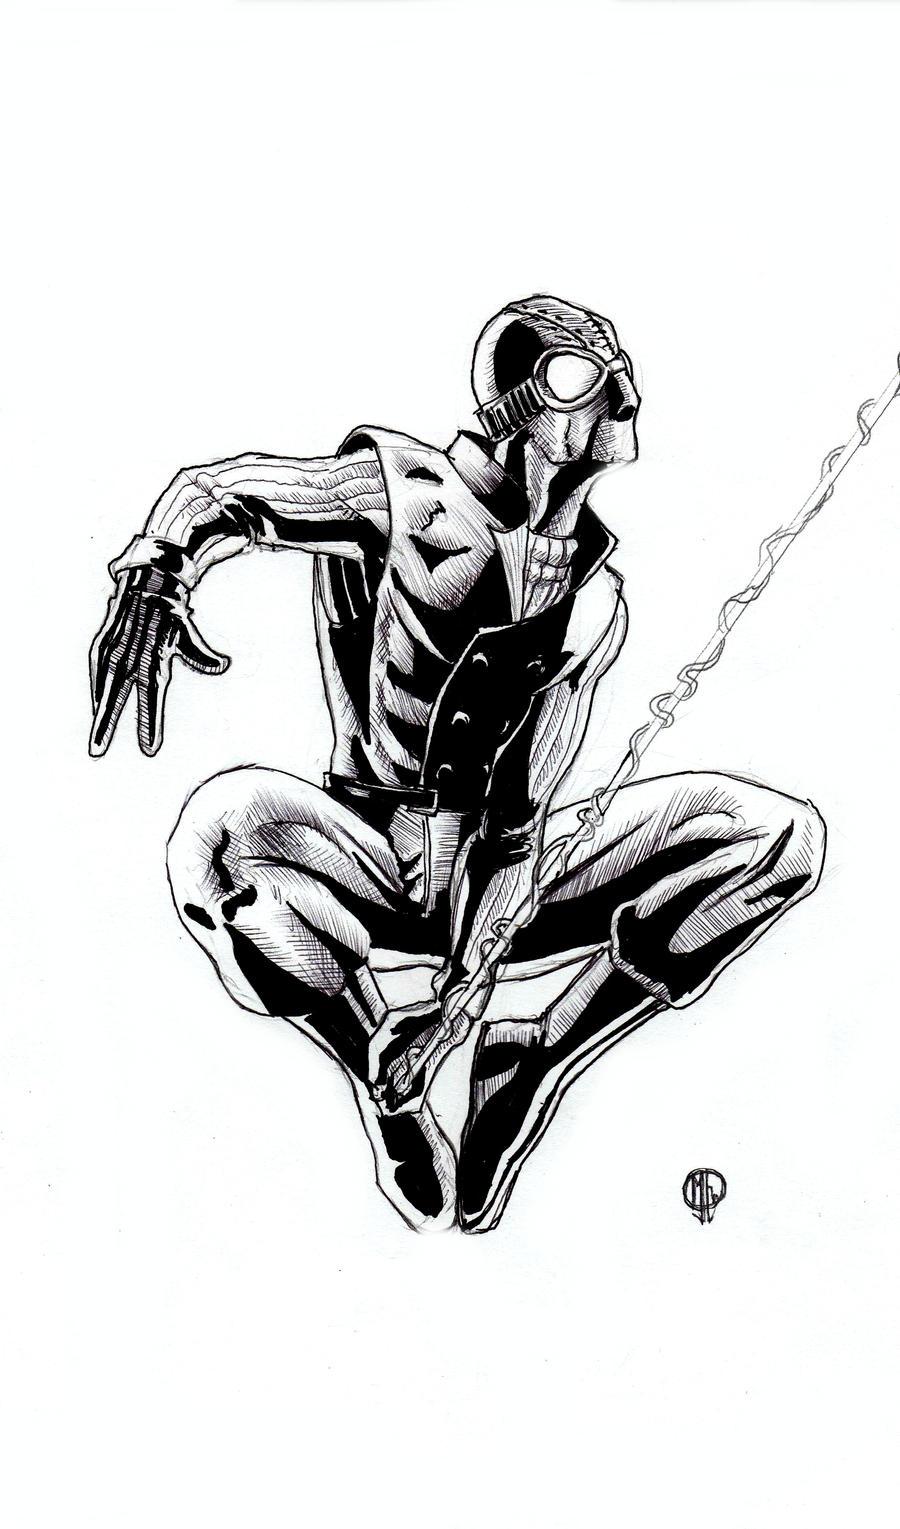 Spider man noir sketch by MuhammedFeyyaz